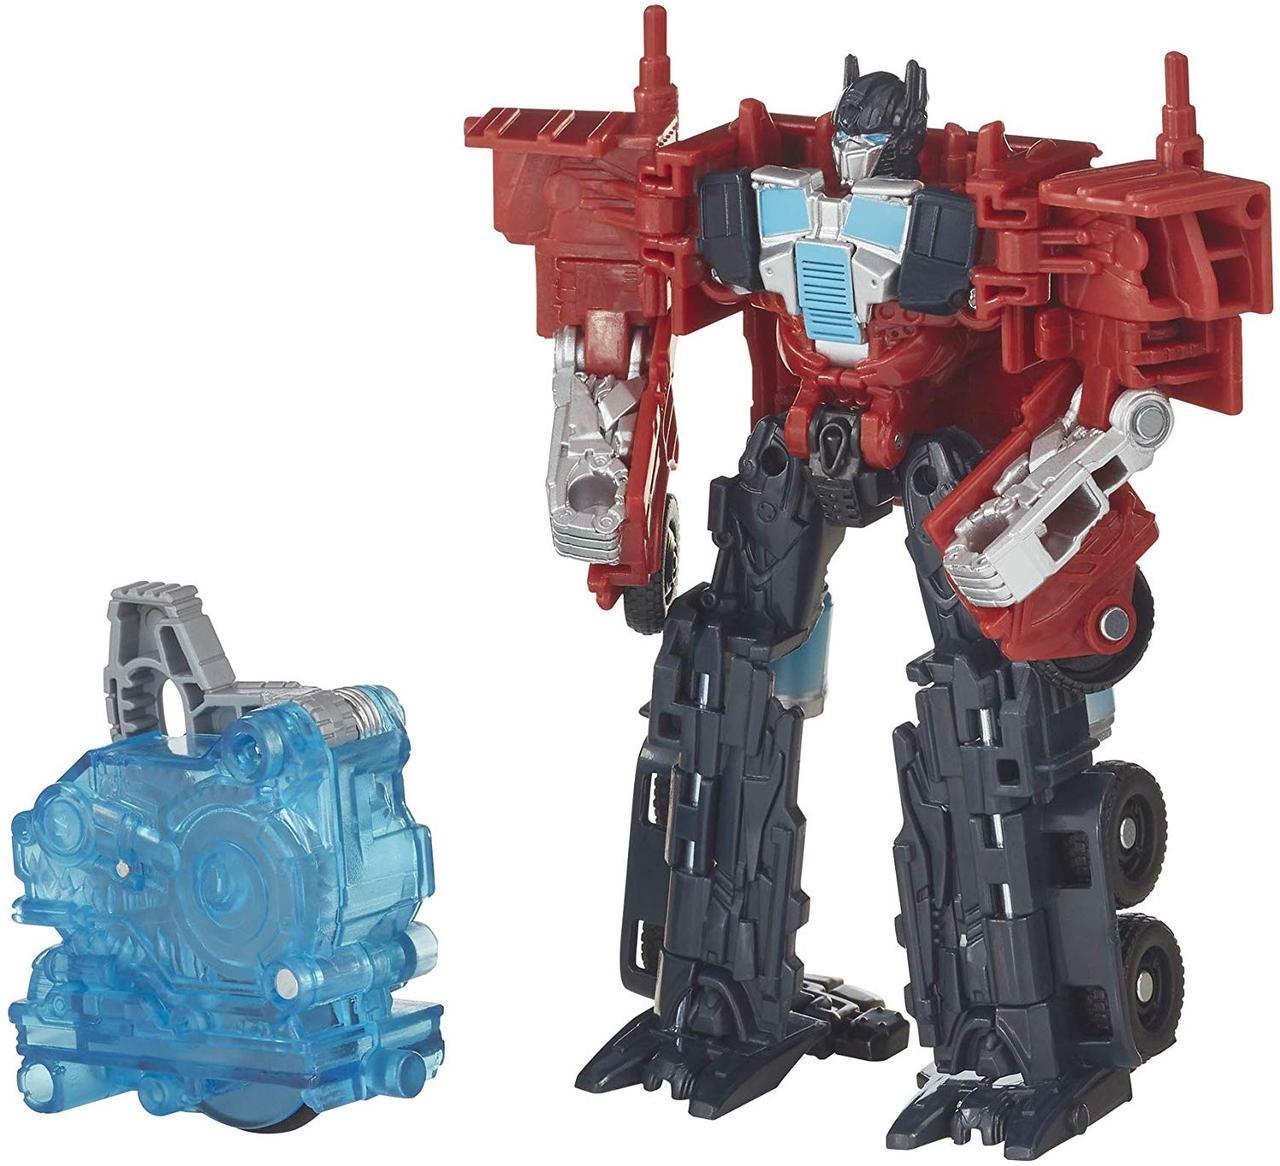 "Робот-трансформер, Hasbro Оптимус Прайм из к/ф ""Бамблби"", 11 см - Optimus Prime, Energon Igniters"